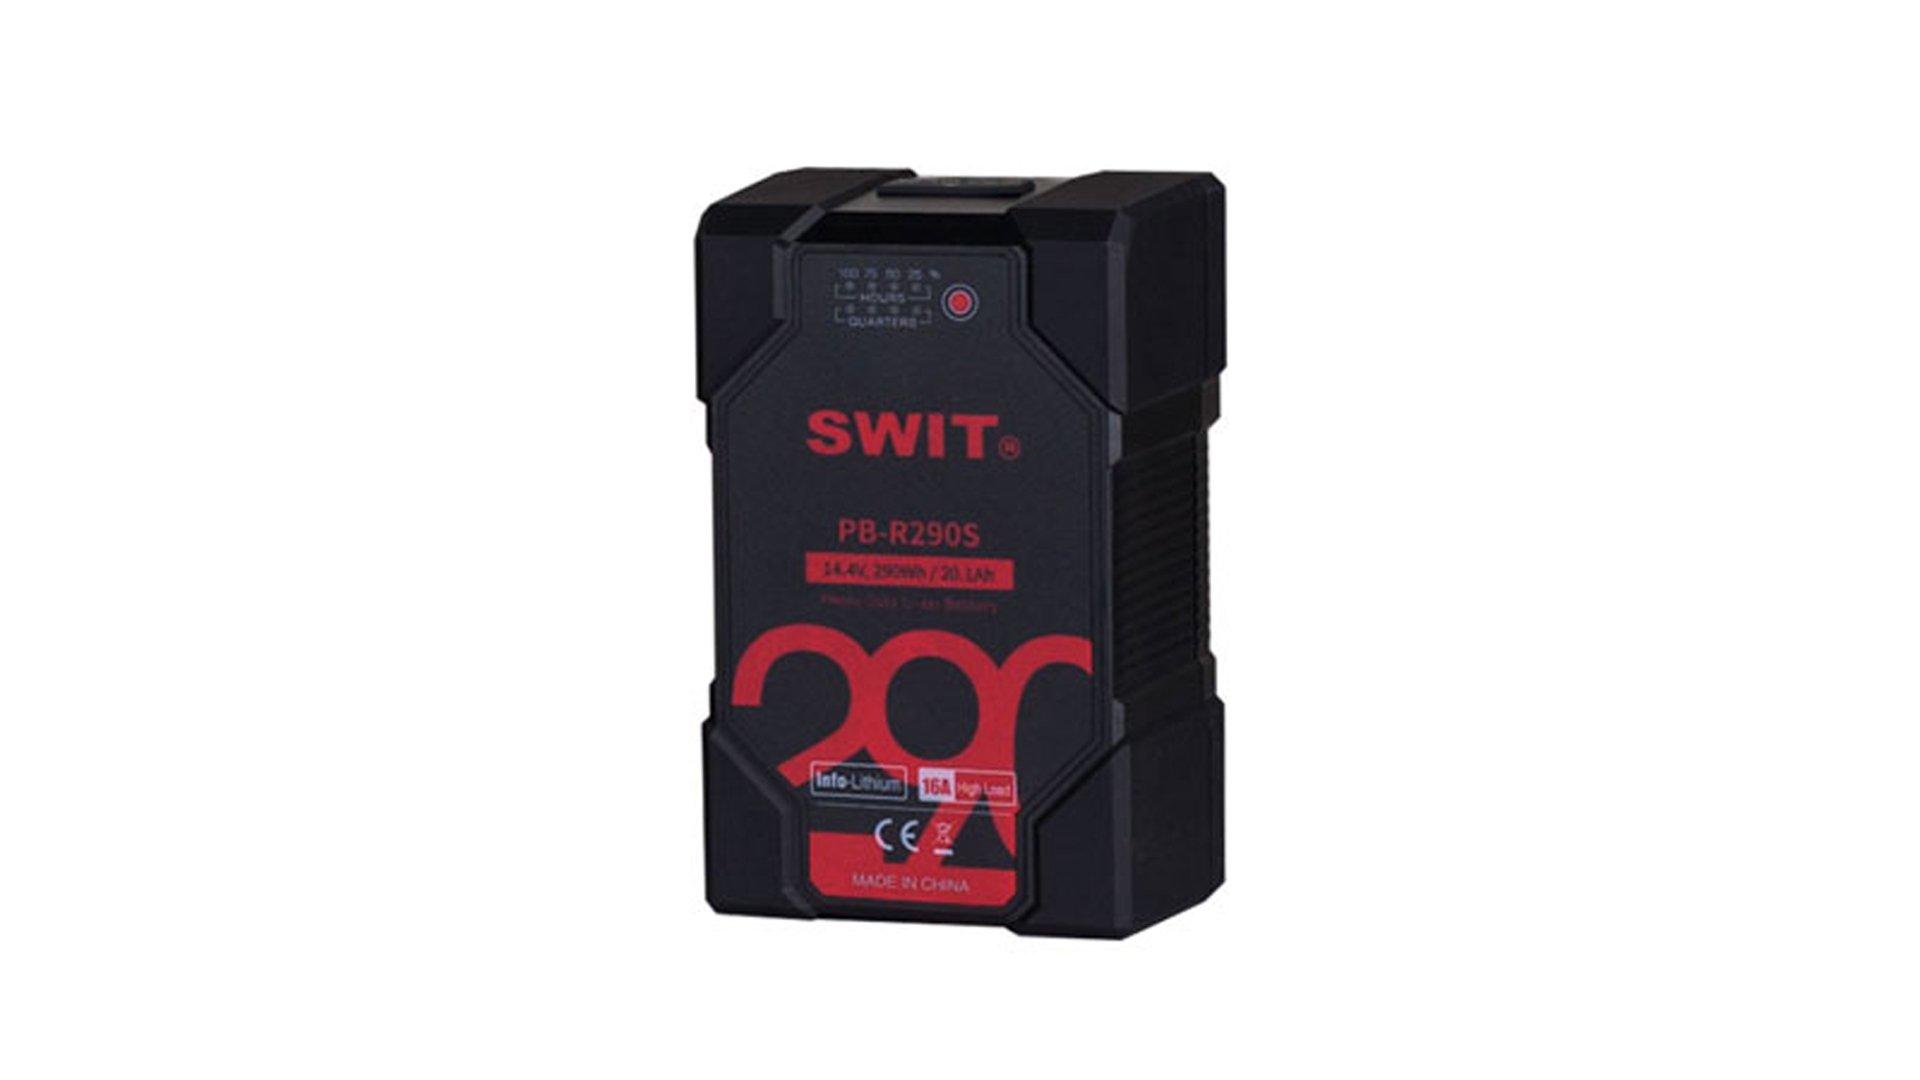 Swit PB R290S | Batteria V lock heavy duty 290Wh per telecamere Cine ed ENG, luci LED, monitor, ponti radio e follow focus | Batterie V Lock